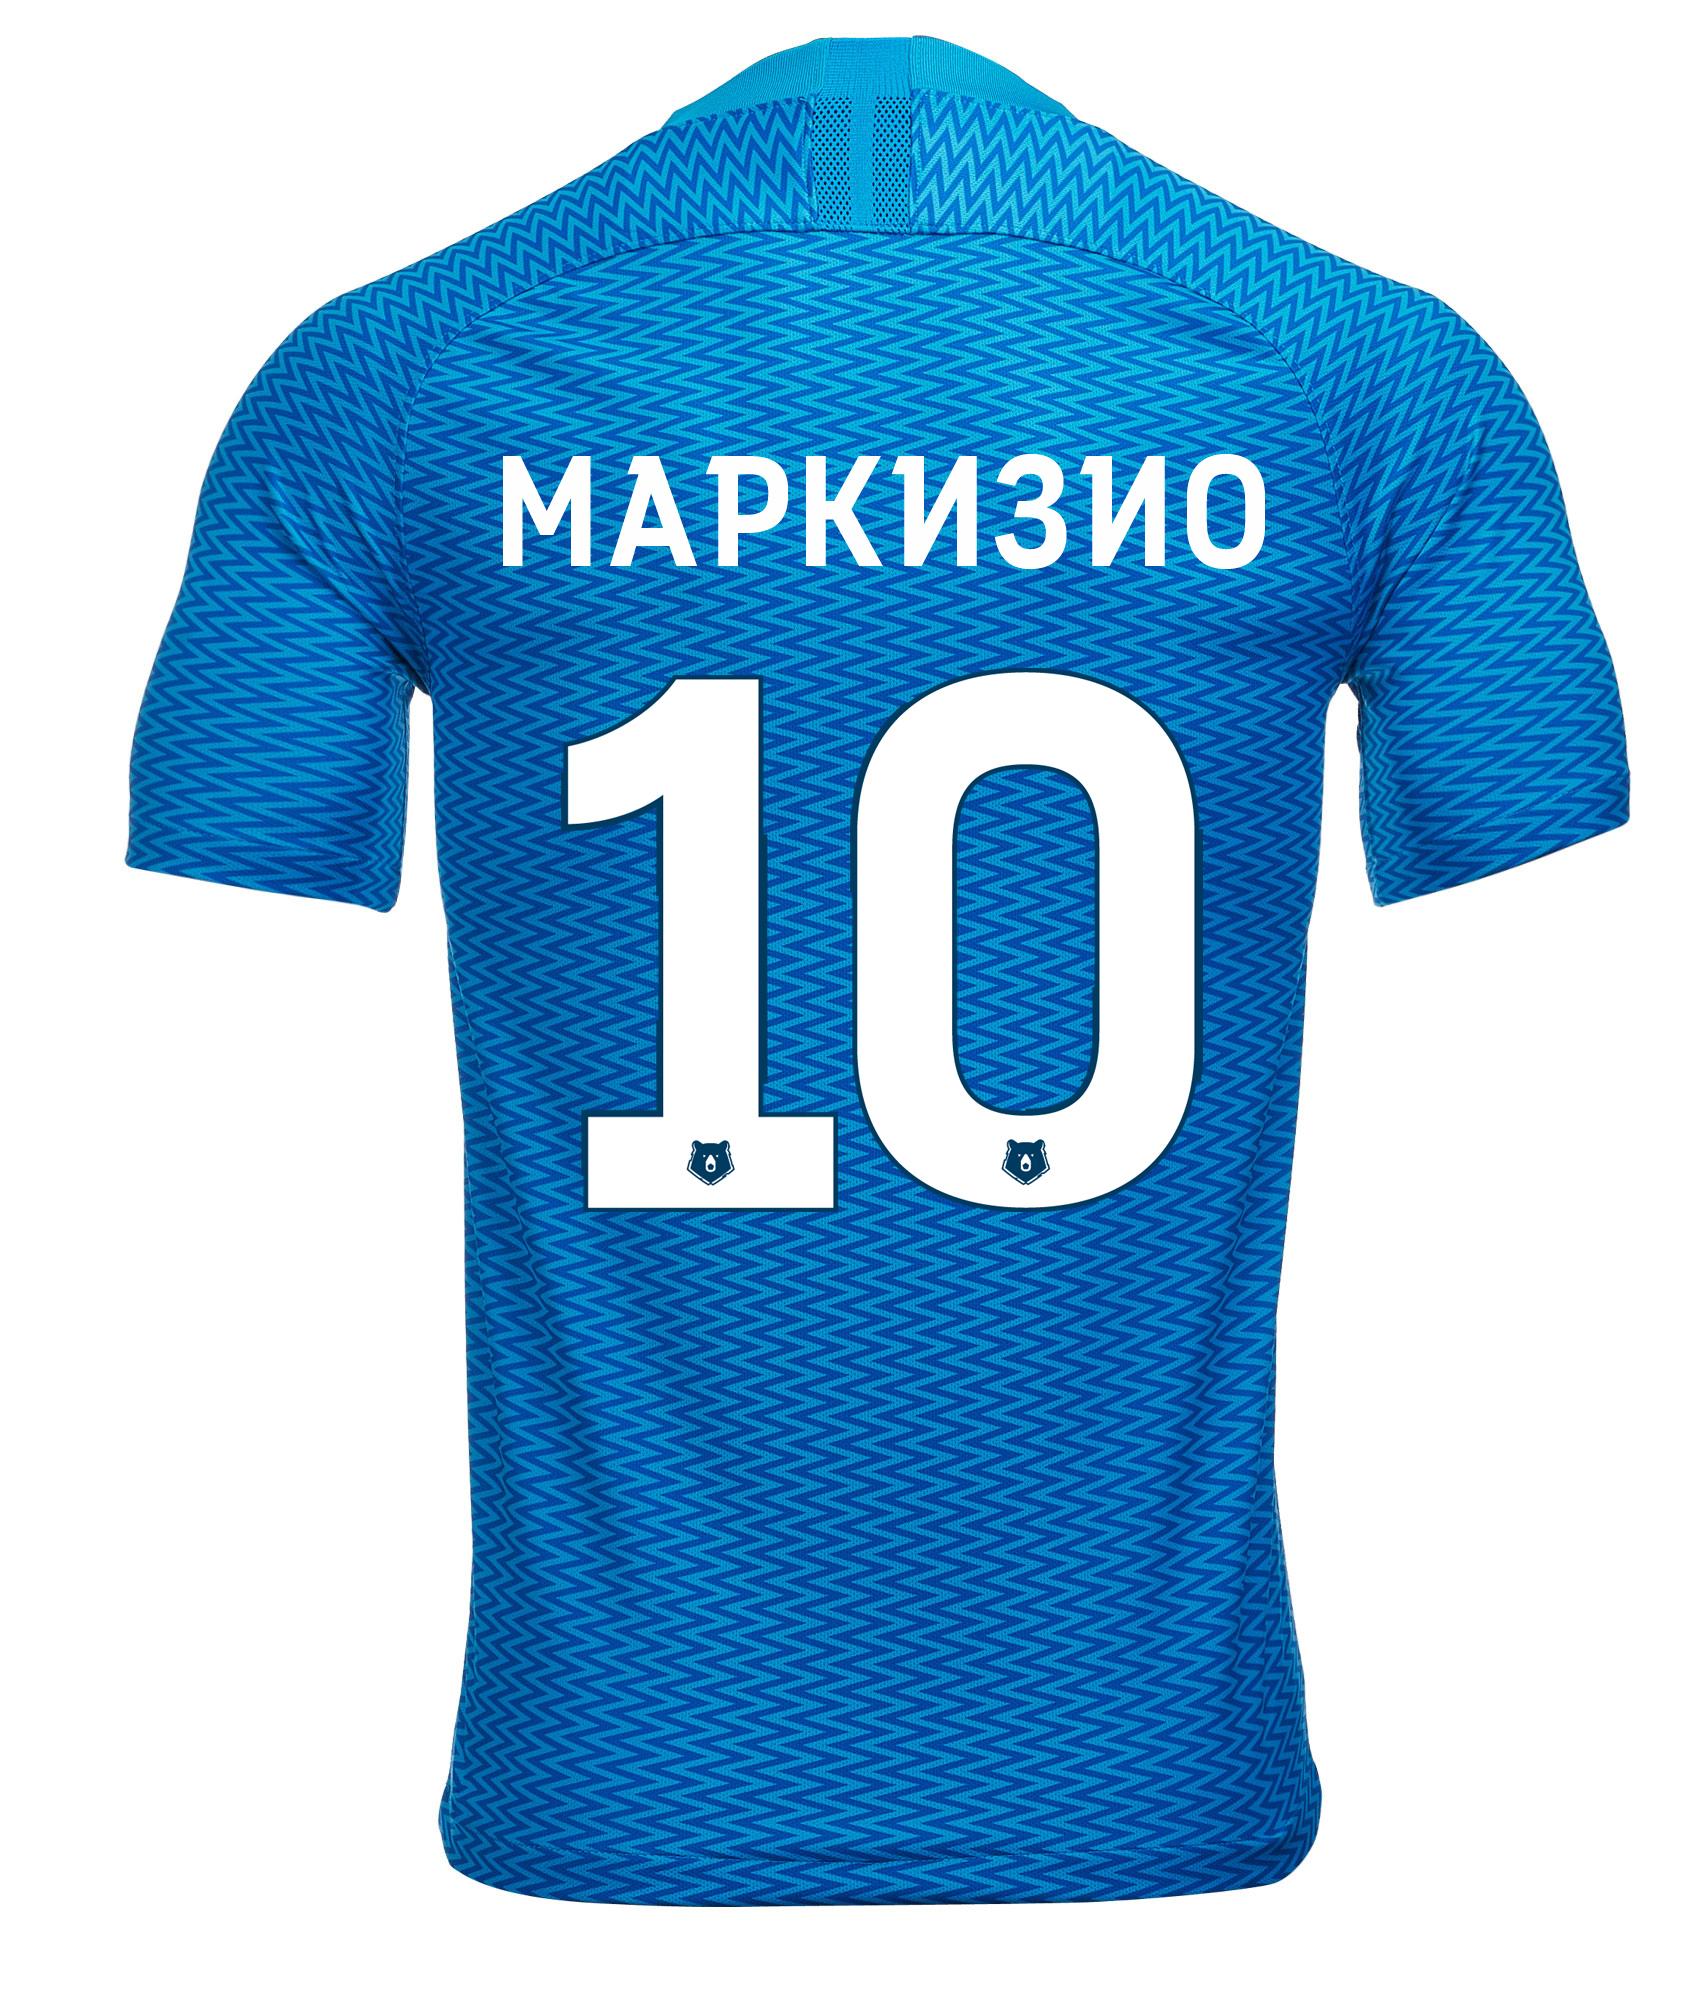 Домашняя игровая футболка Nike Маркизио 10 2018/19 Зенит футболка игровая домашняя nike barcelona 2018 19